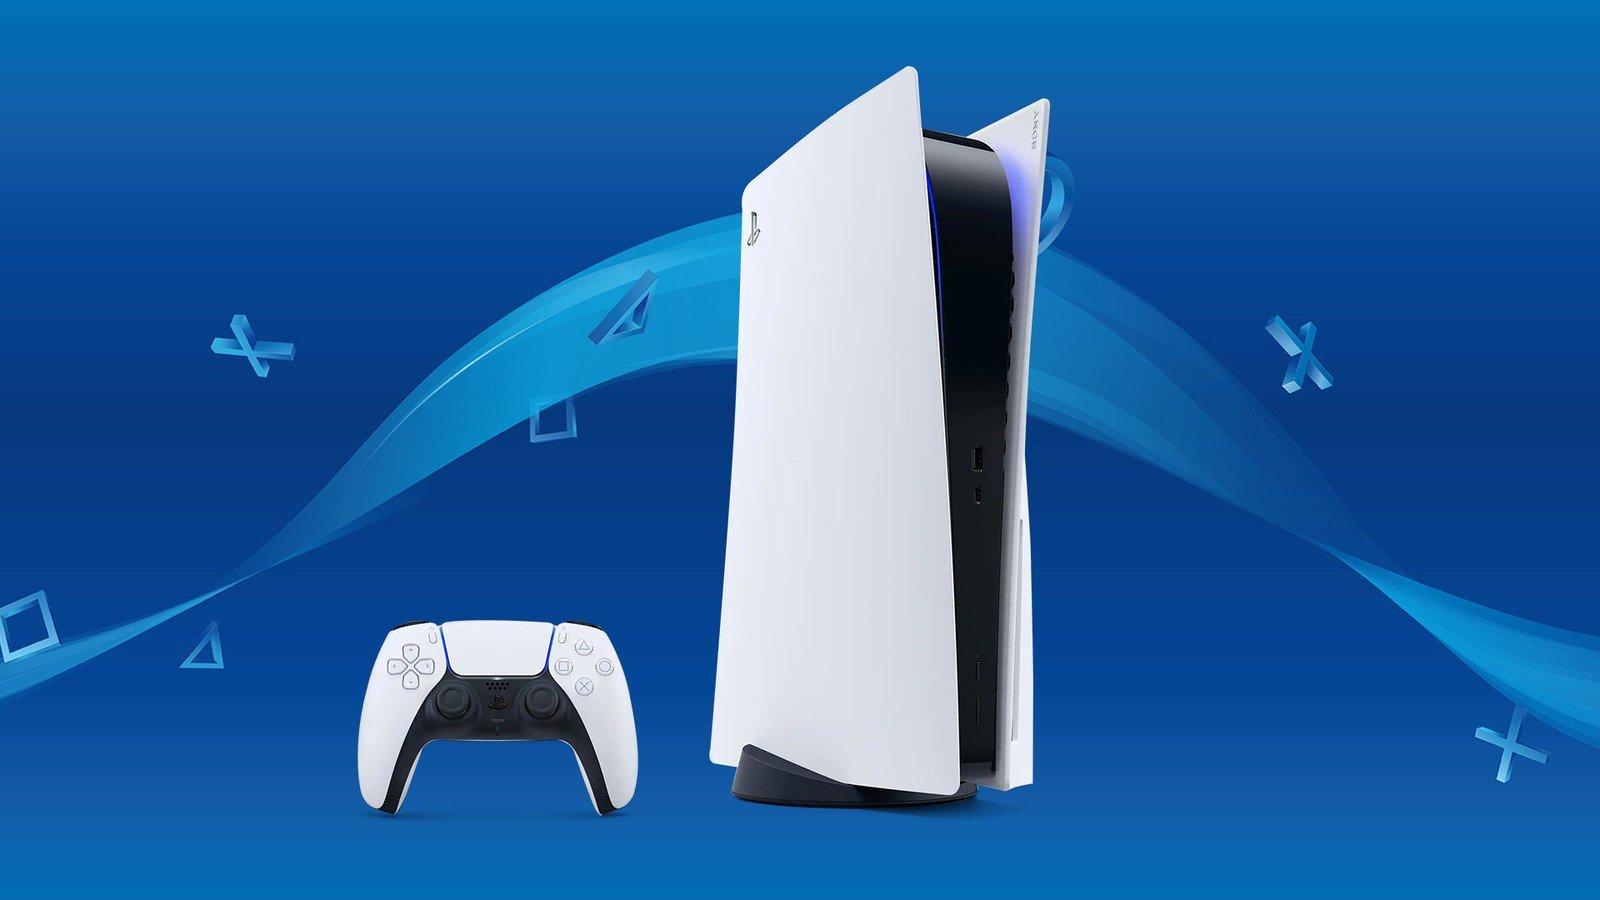 Playstation 5 Wallpaper 1600900 00814 HD Wallpapers 1600x900